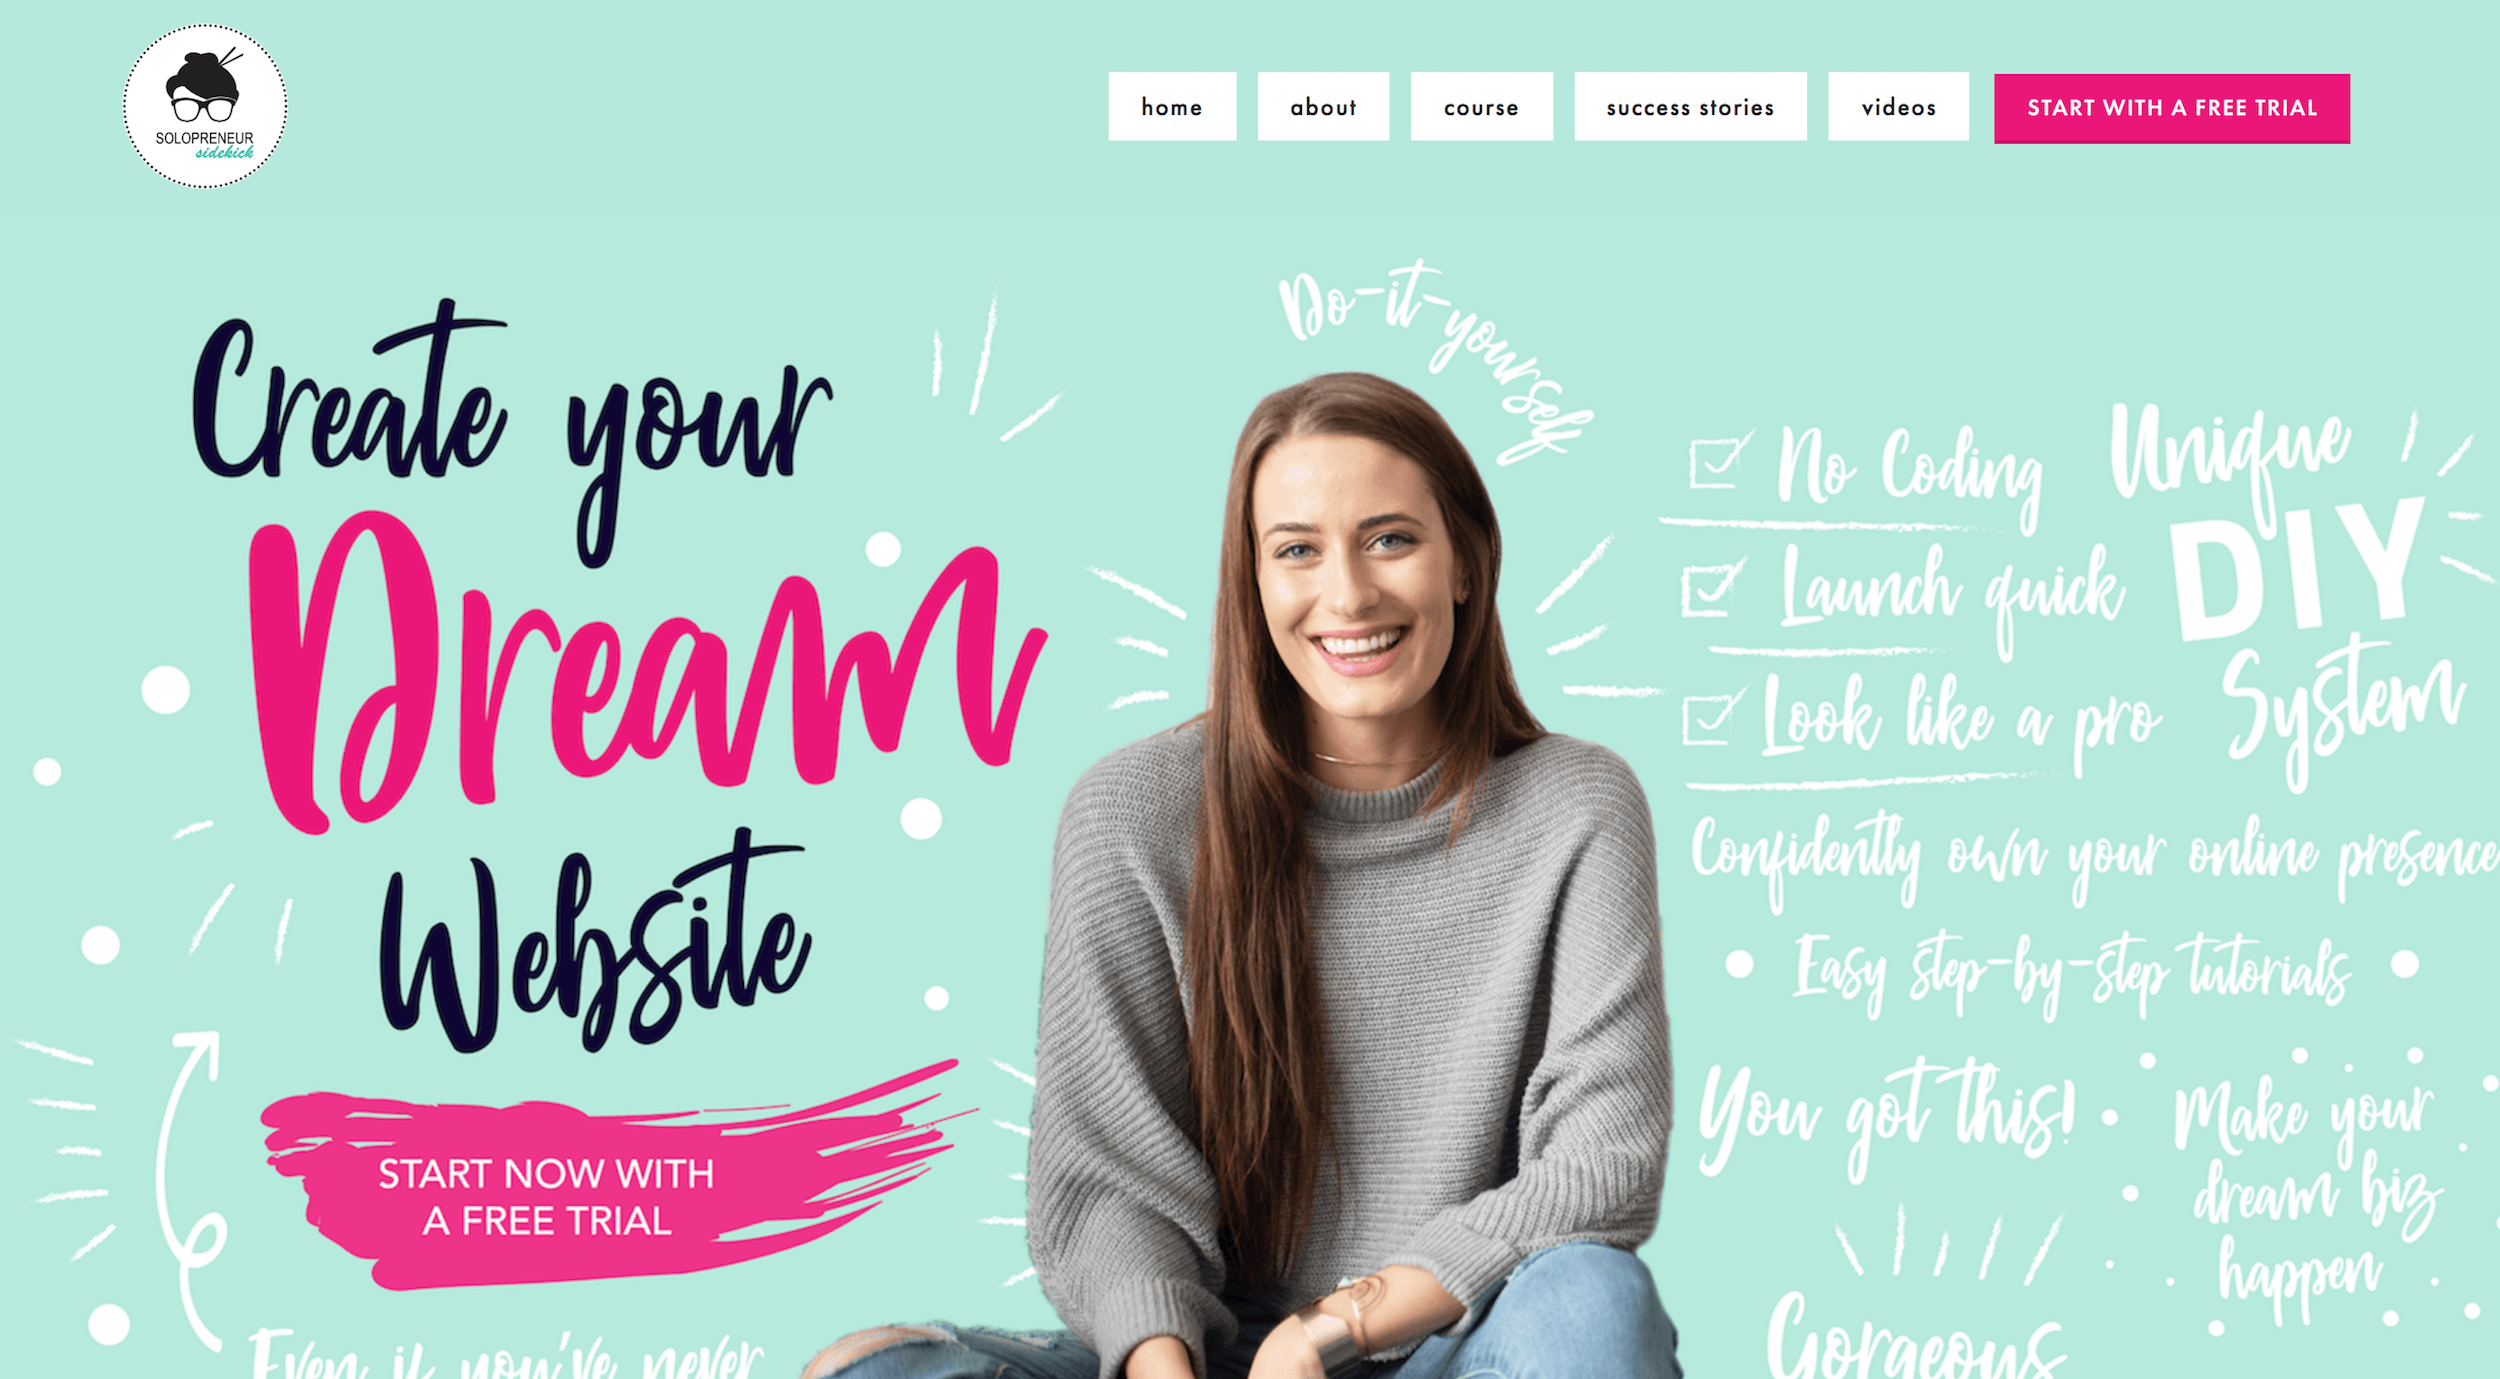 Squarespace-Website-Example-Solopreneur-Sidekick